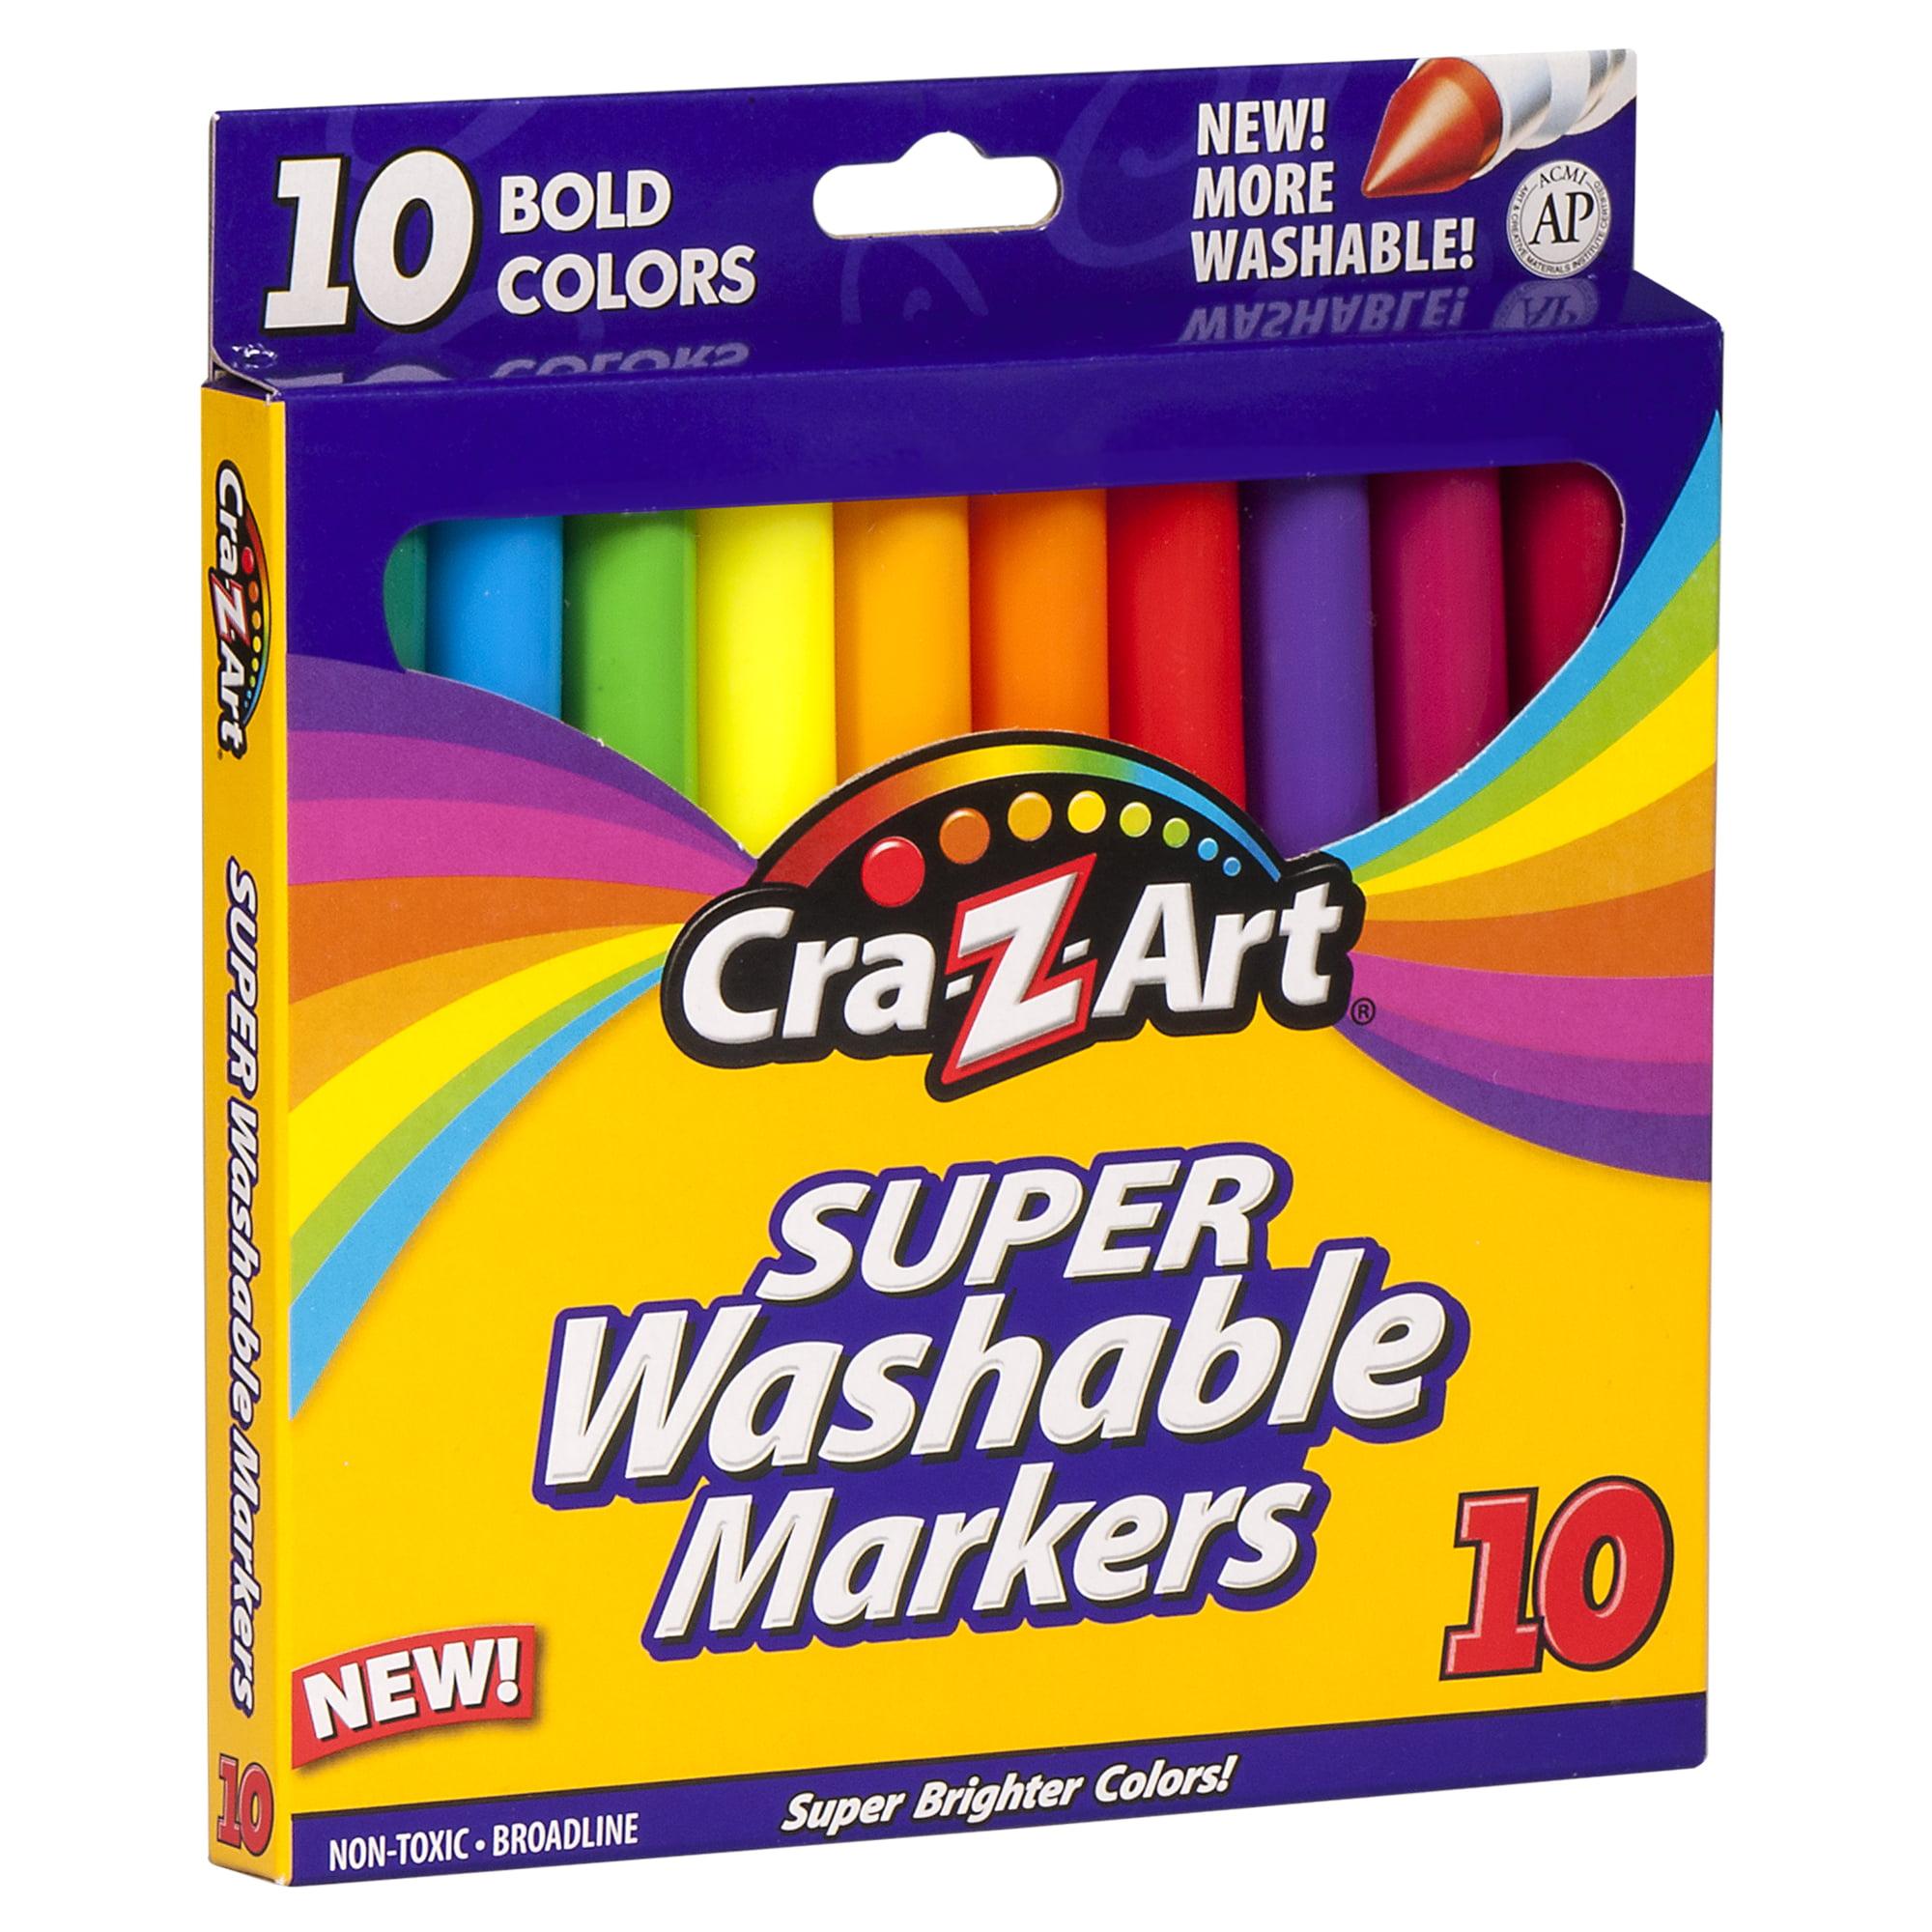 Cra-Z-Art Bold Washable Broadline Markers - 10 Count